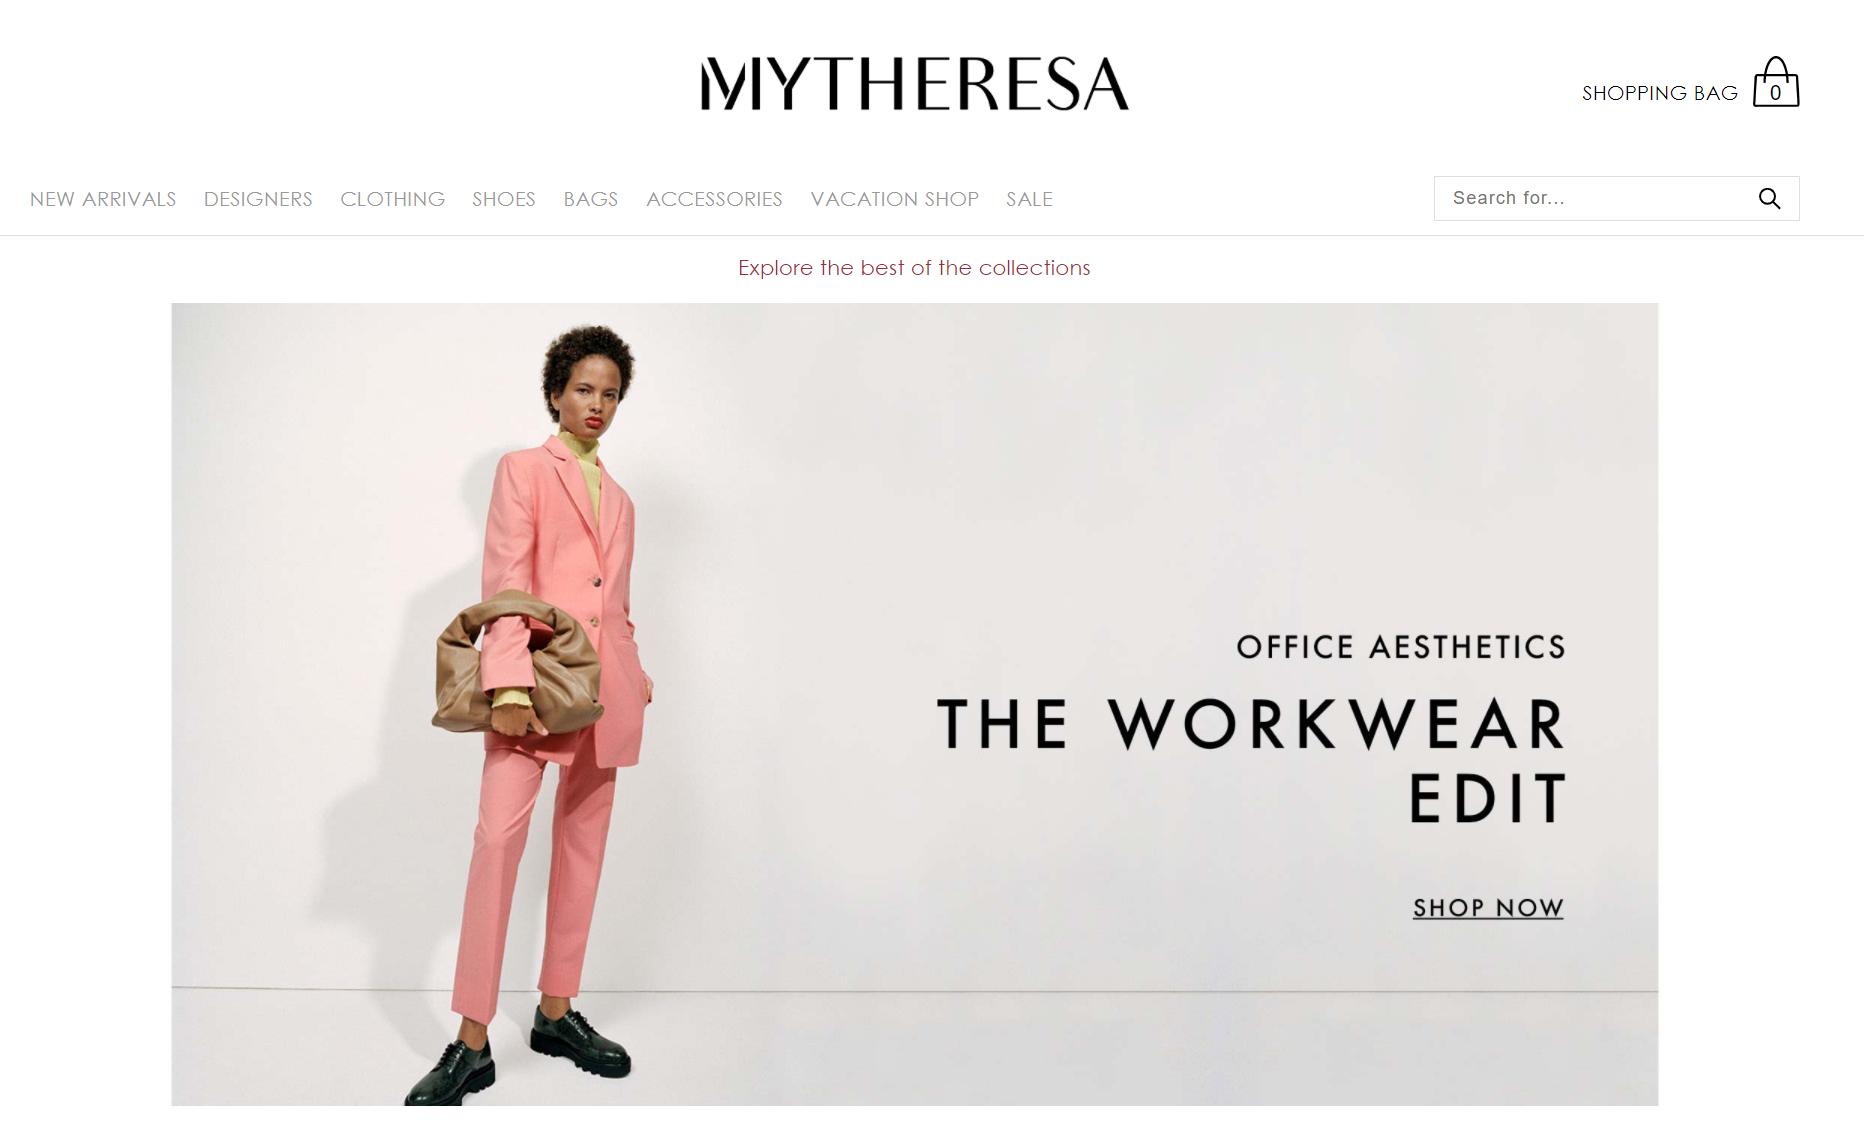 Neiman Marcus 化解破产危机:将转让旗下奢侈品电商 MyTheresa 以减免40亿美元债务